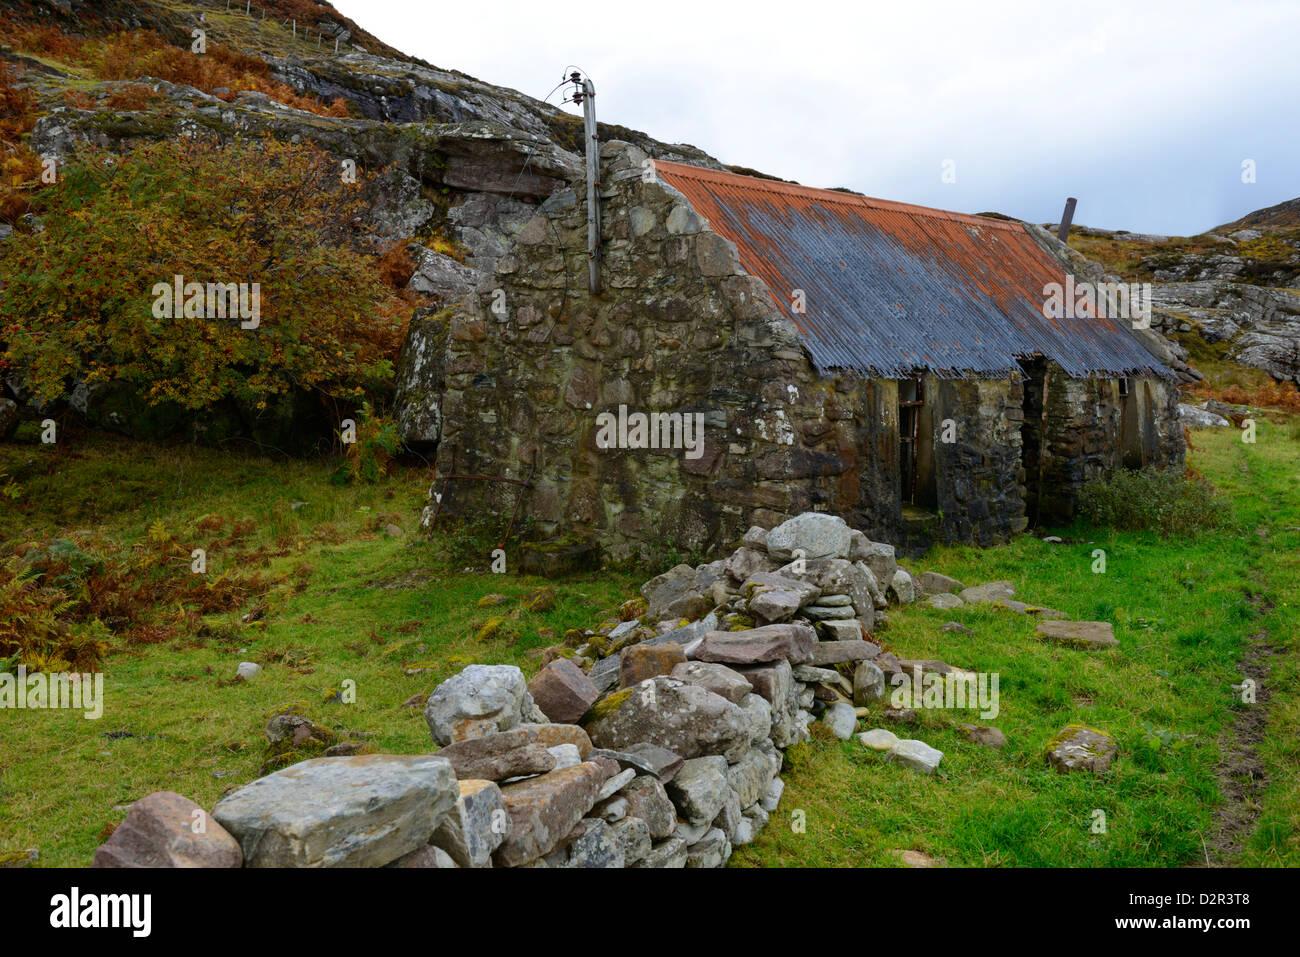 Ruined croft, Ardmair, Ullapool, Highlands, Scotland, United Kingdom, Europe - Stock Image